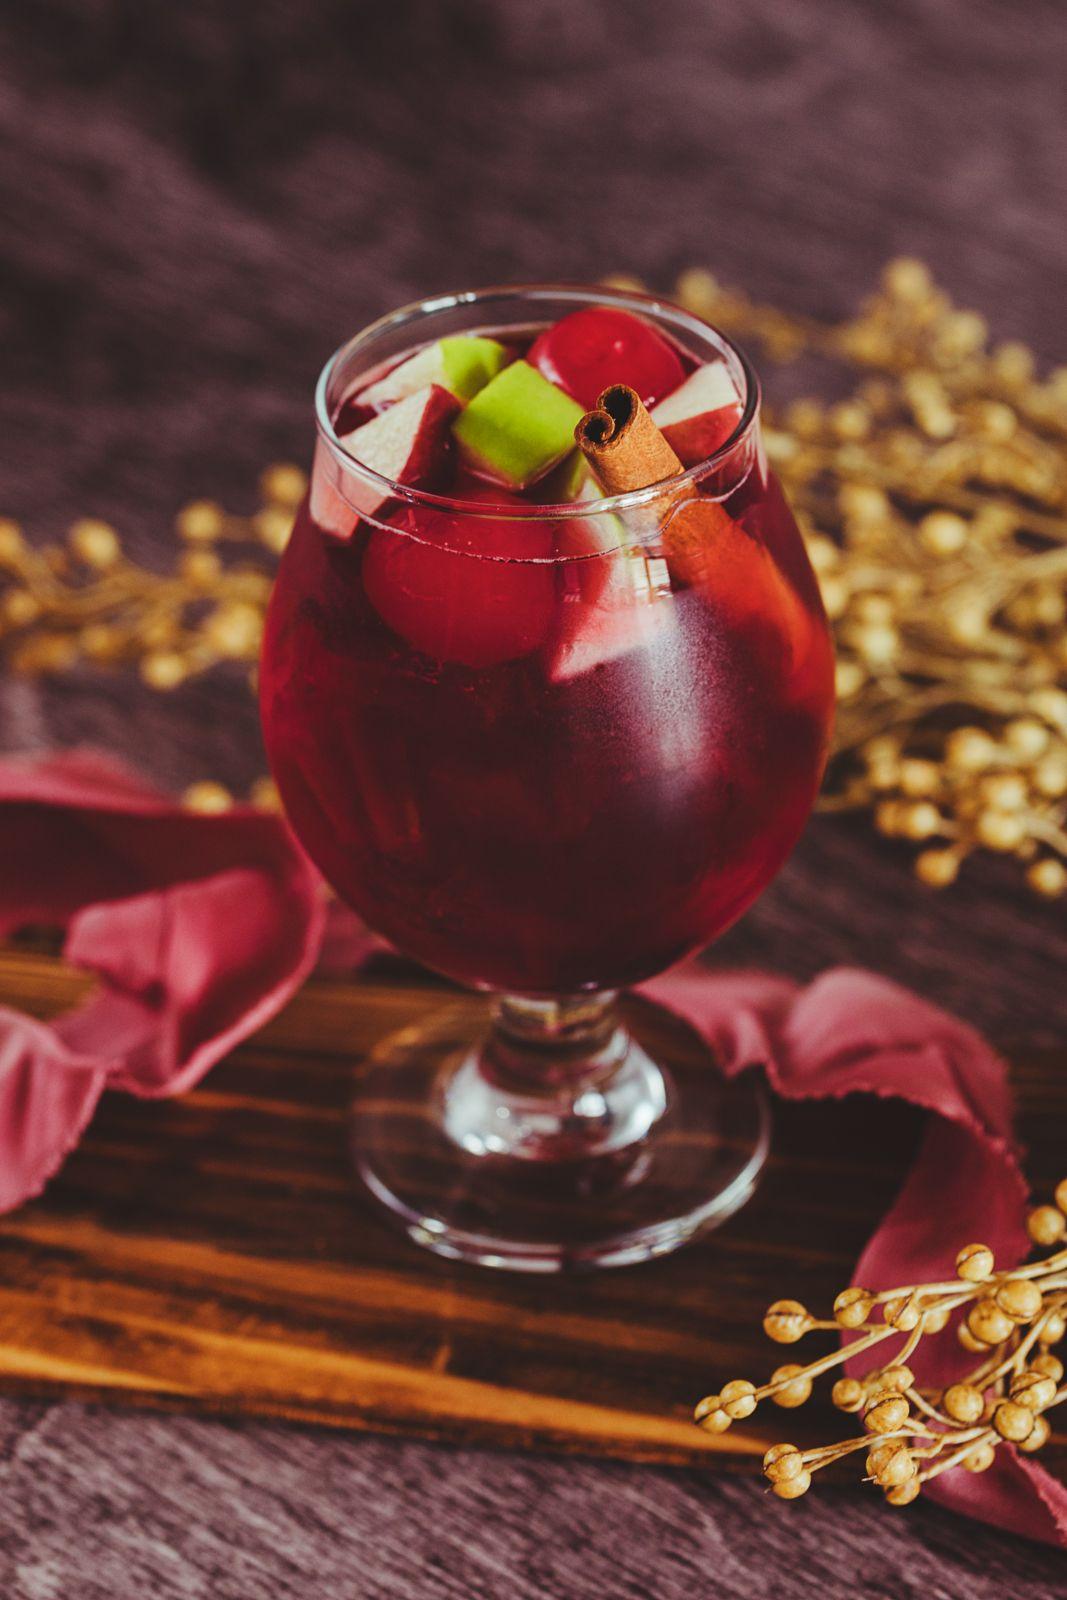 8 FALL WEDDING SIGNATURE DRINKS Wedding signature drinks